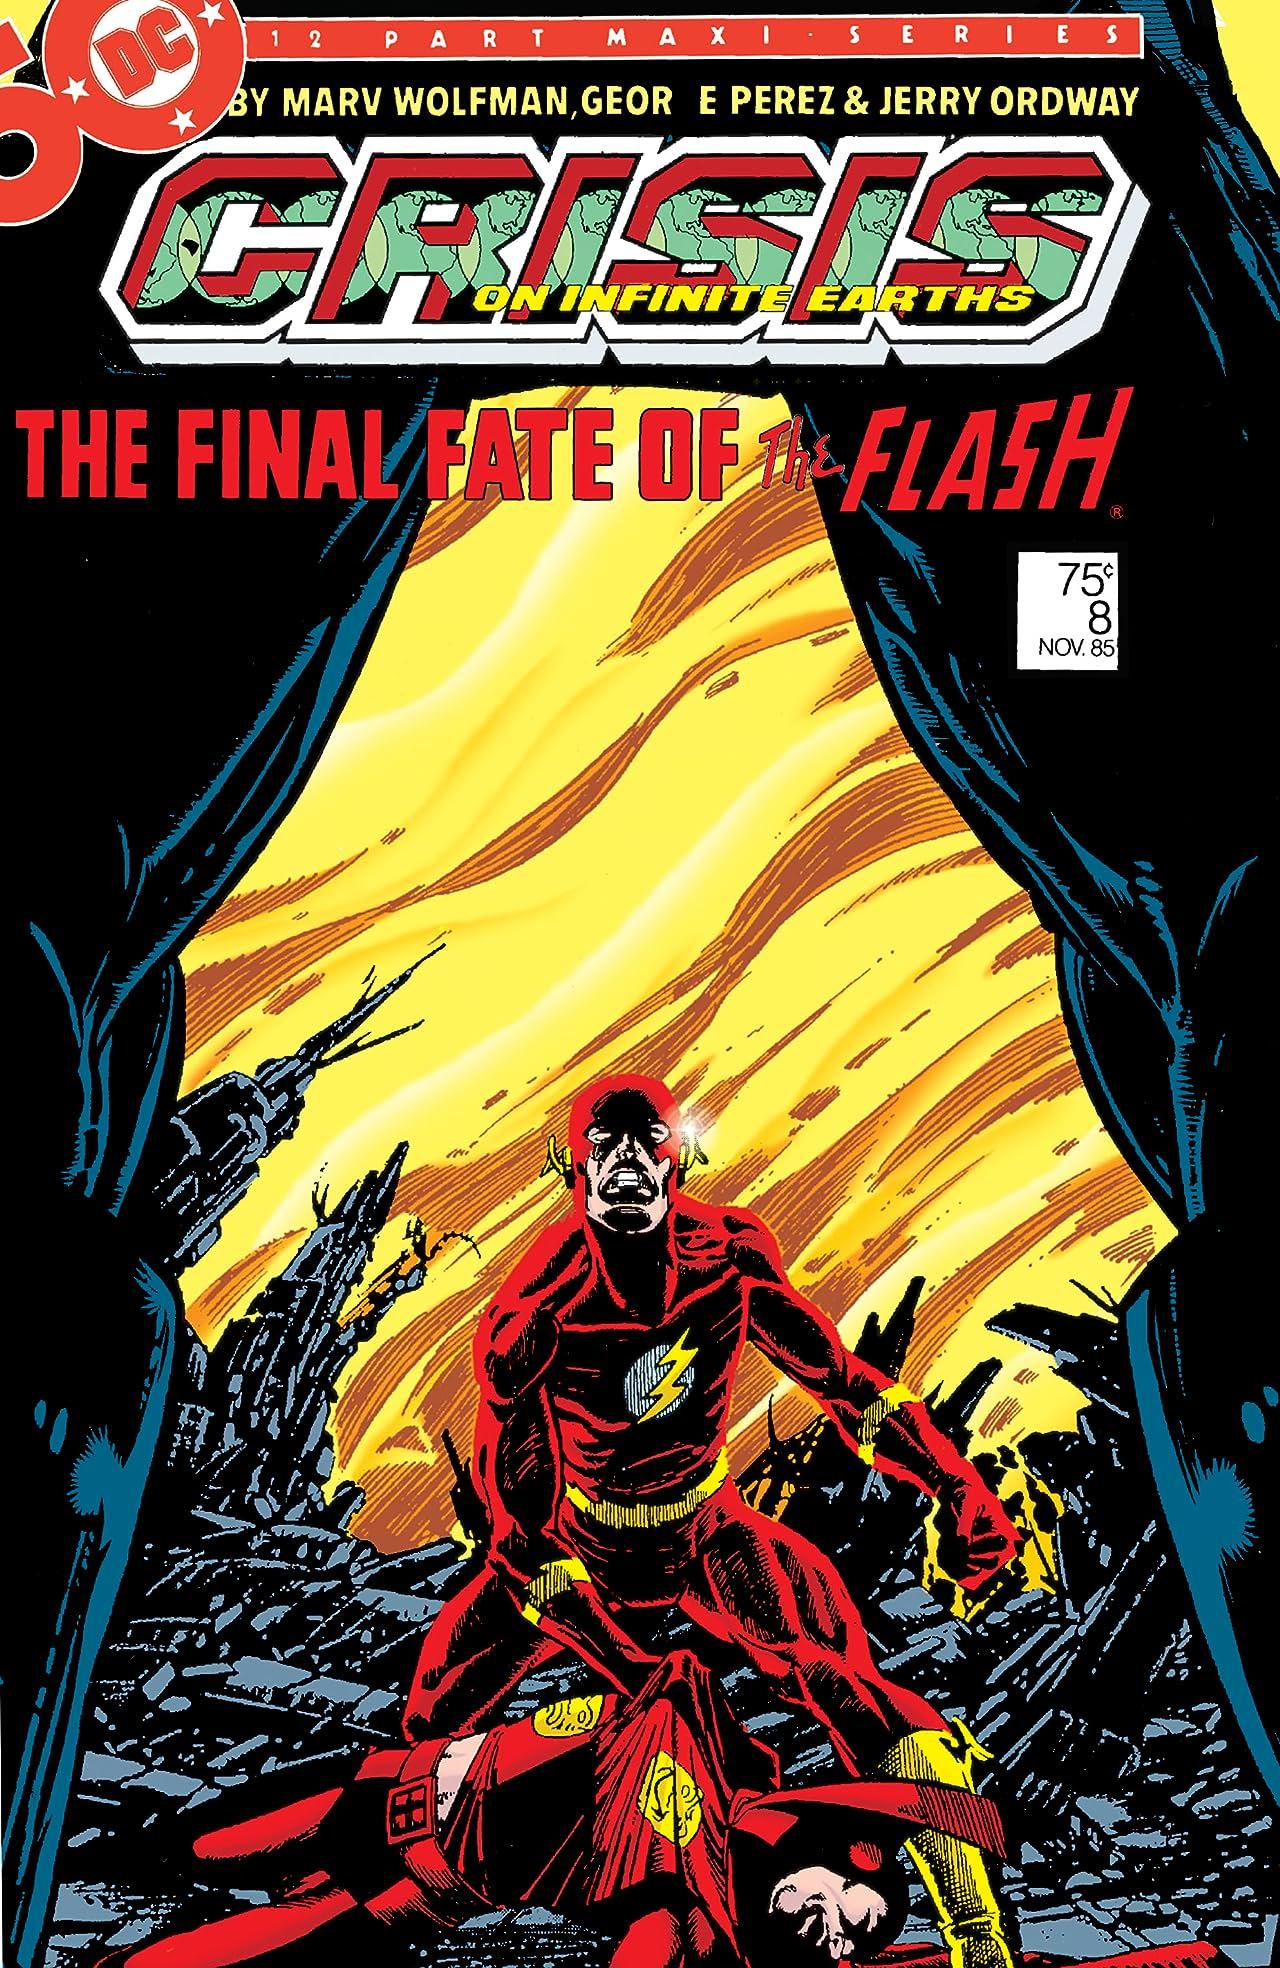 Crisis on Infinite Earths #8